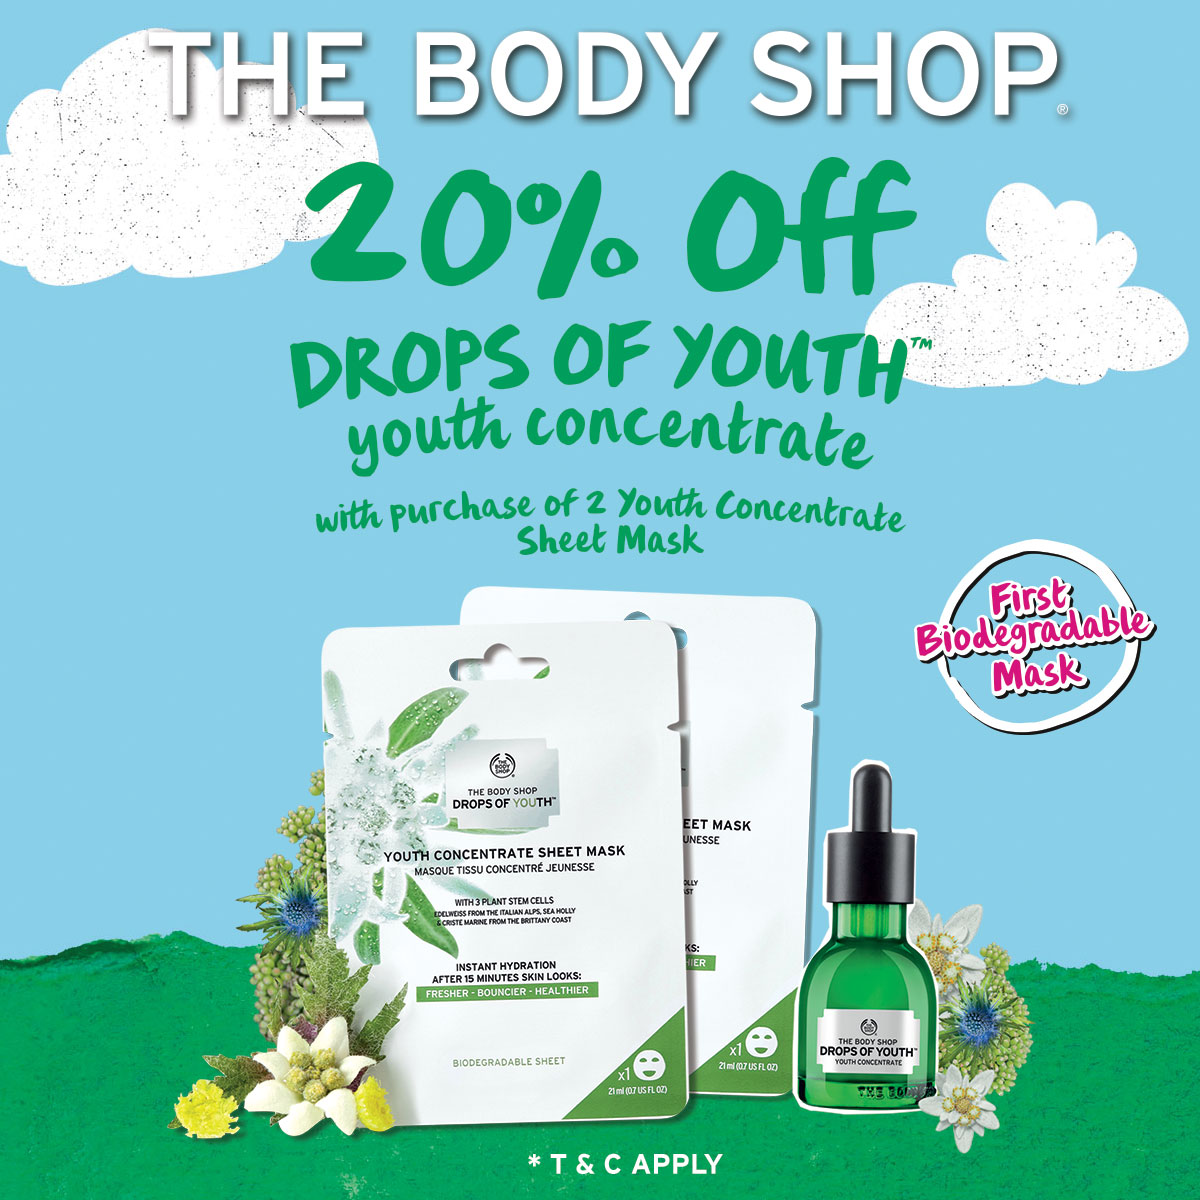 Body Shop Promotion